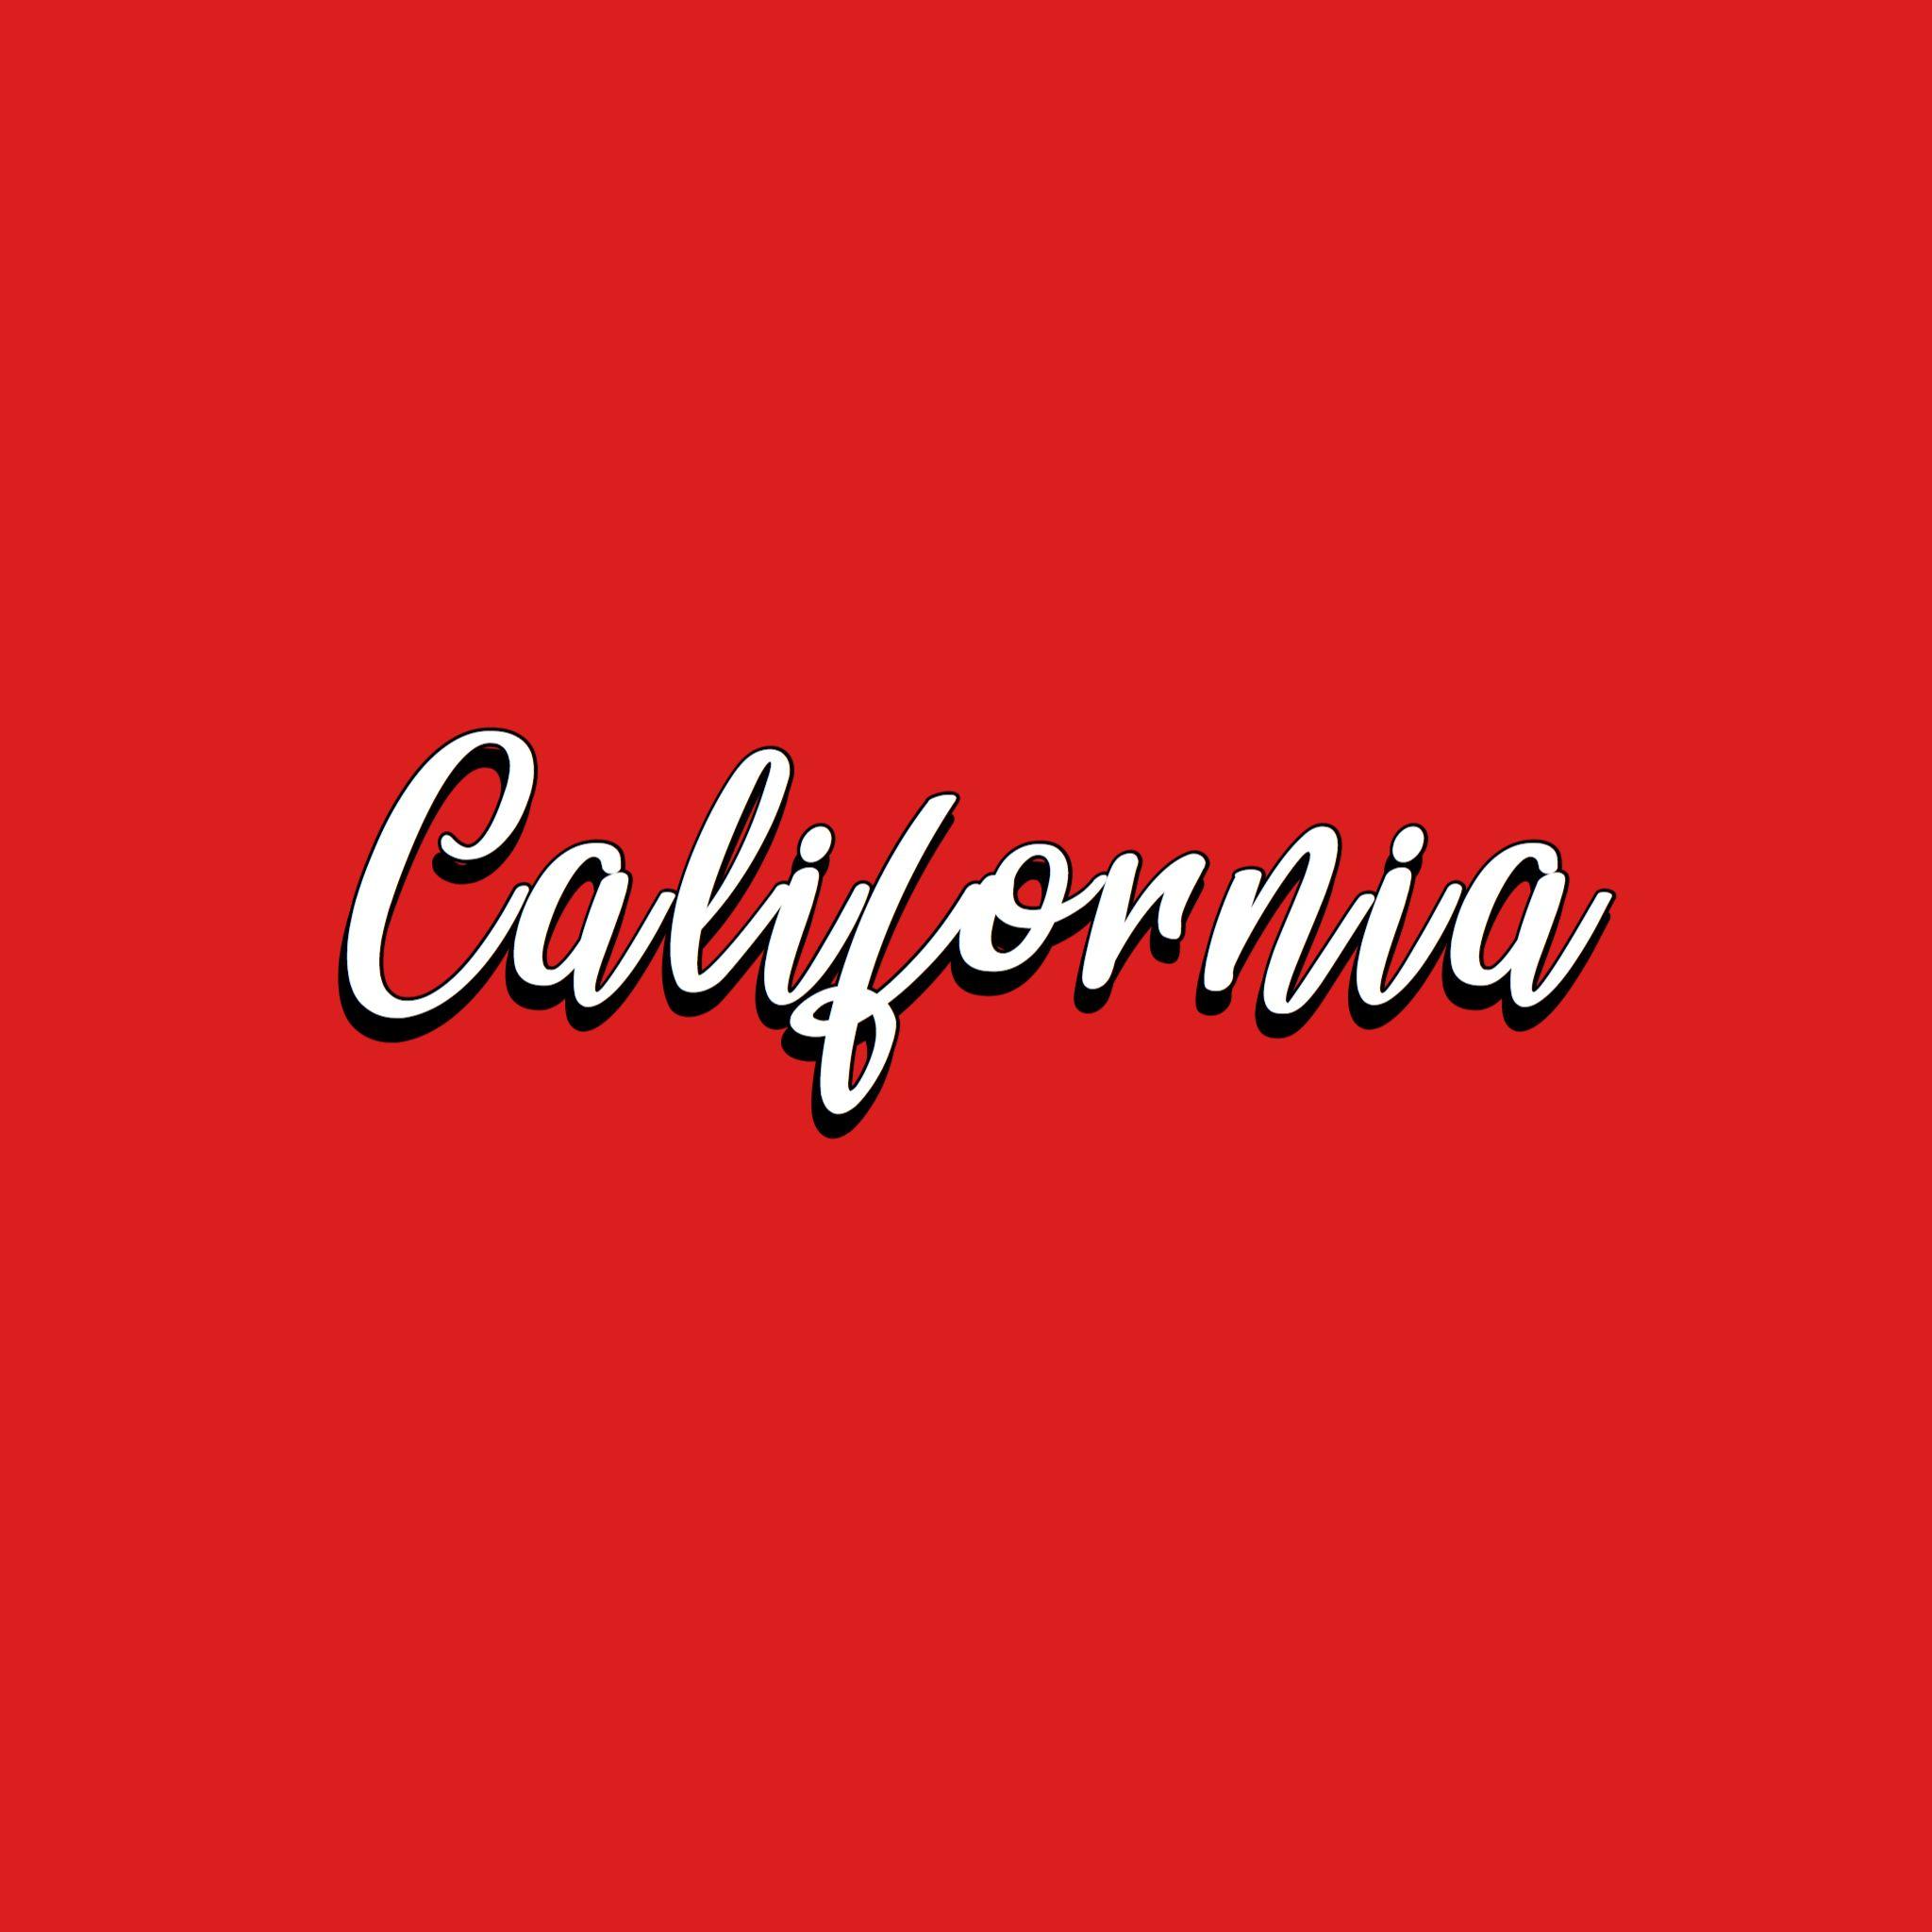 California California Dreaming California Word Red Red Background California Design Aesthetic Red Aes Red Aesthetic Aesthetic Wallpapers Red Photography